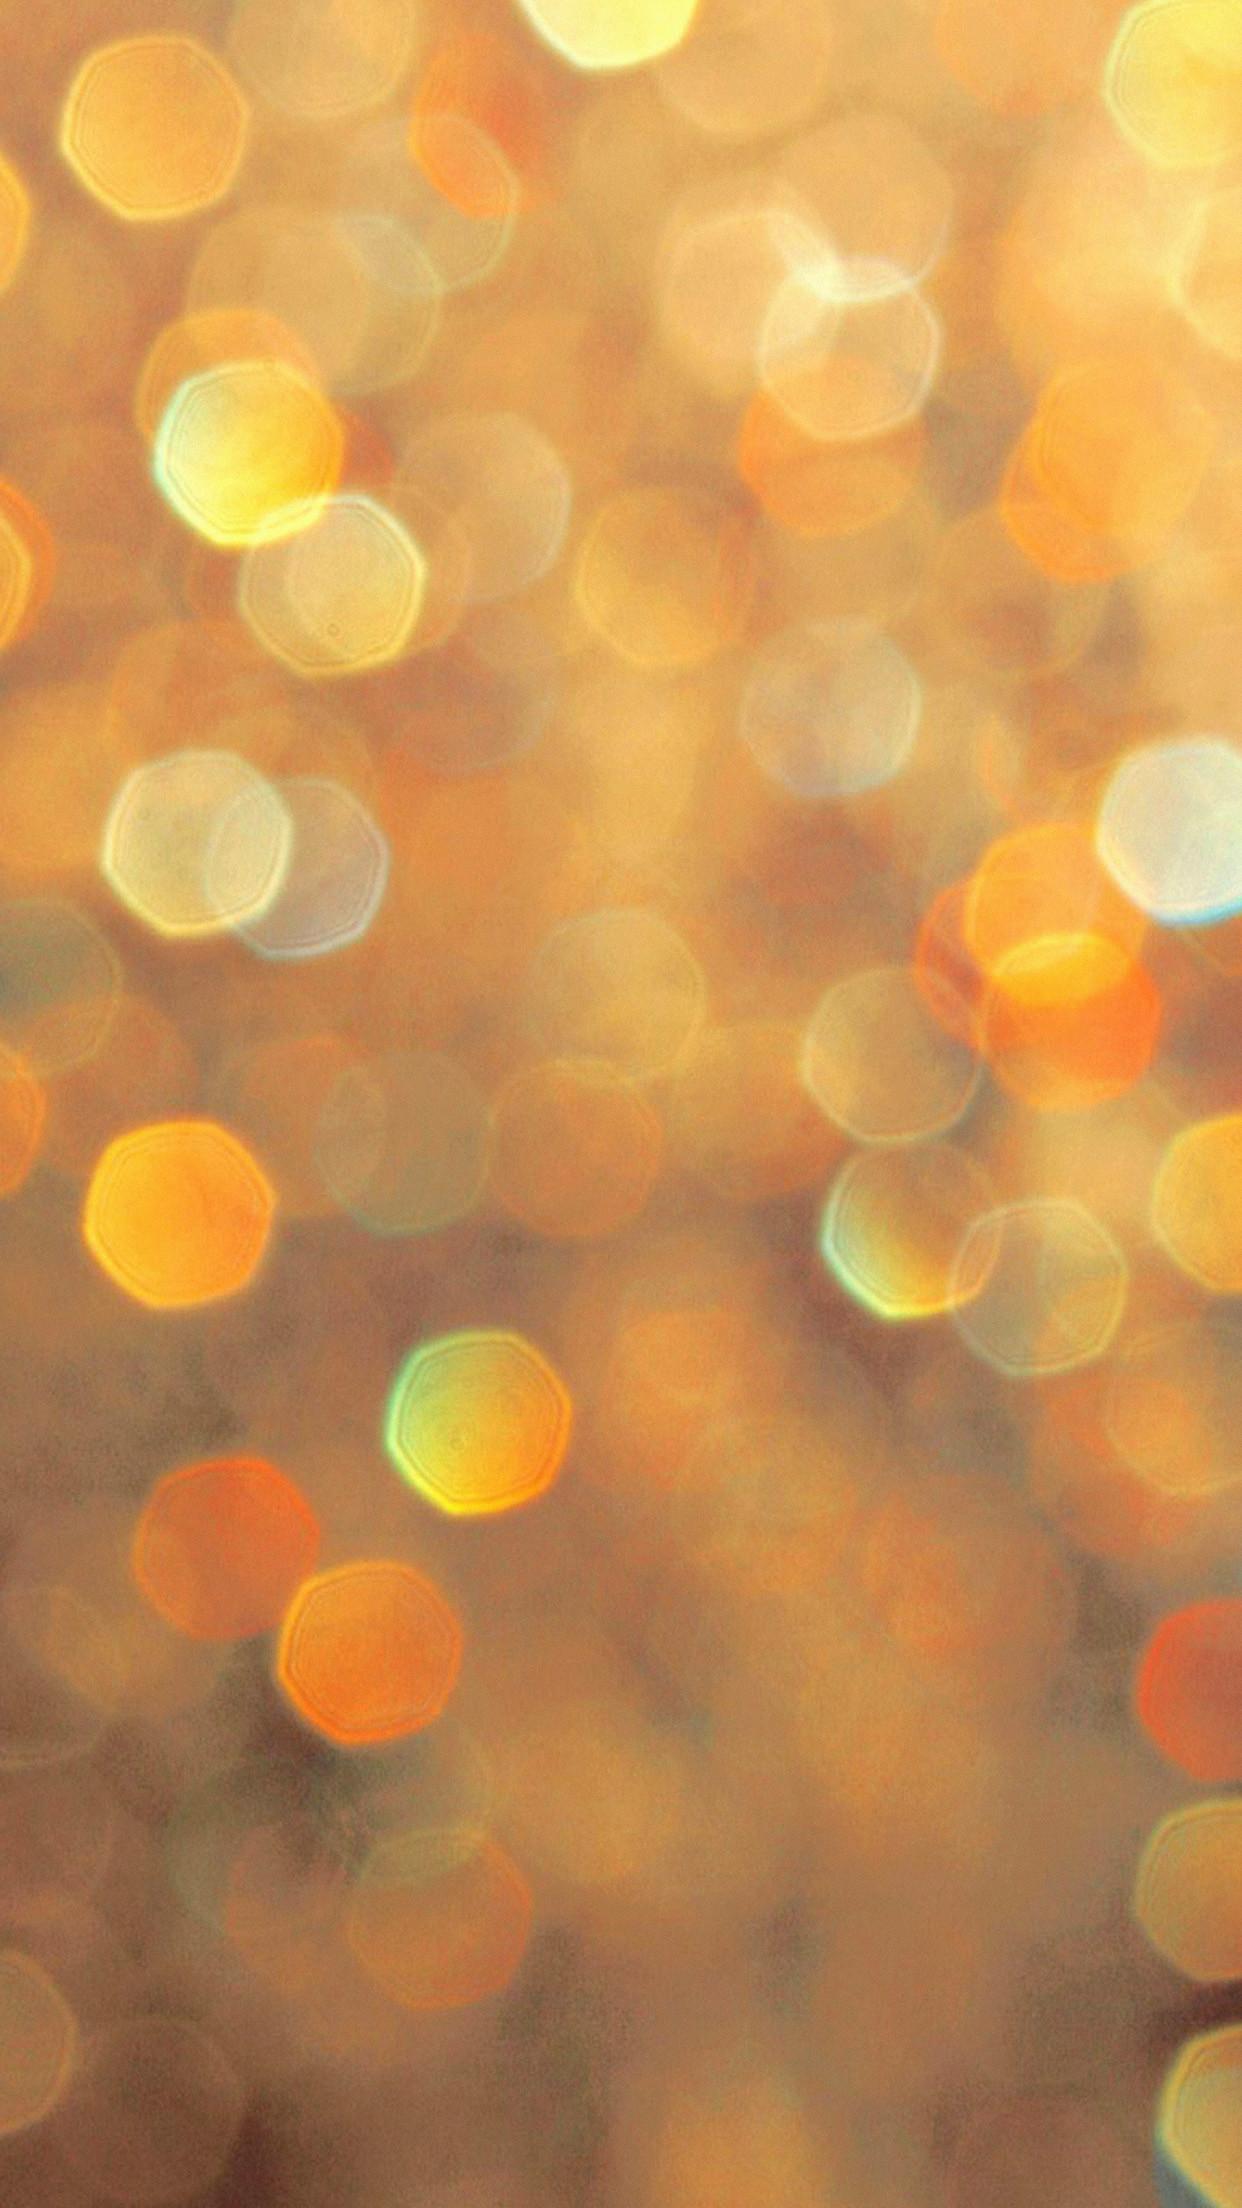 Gold Orange Bokeh Lights Sparkles Android Wallpaper …